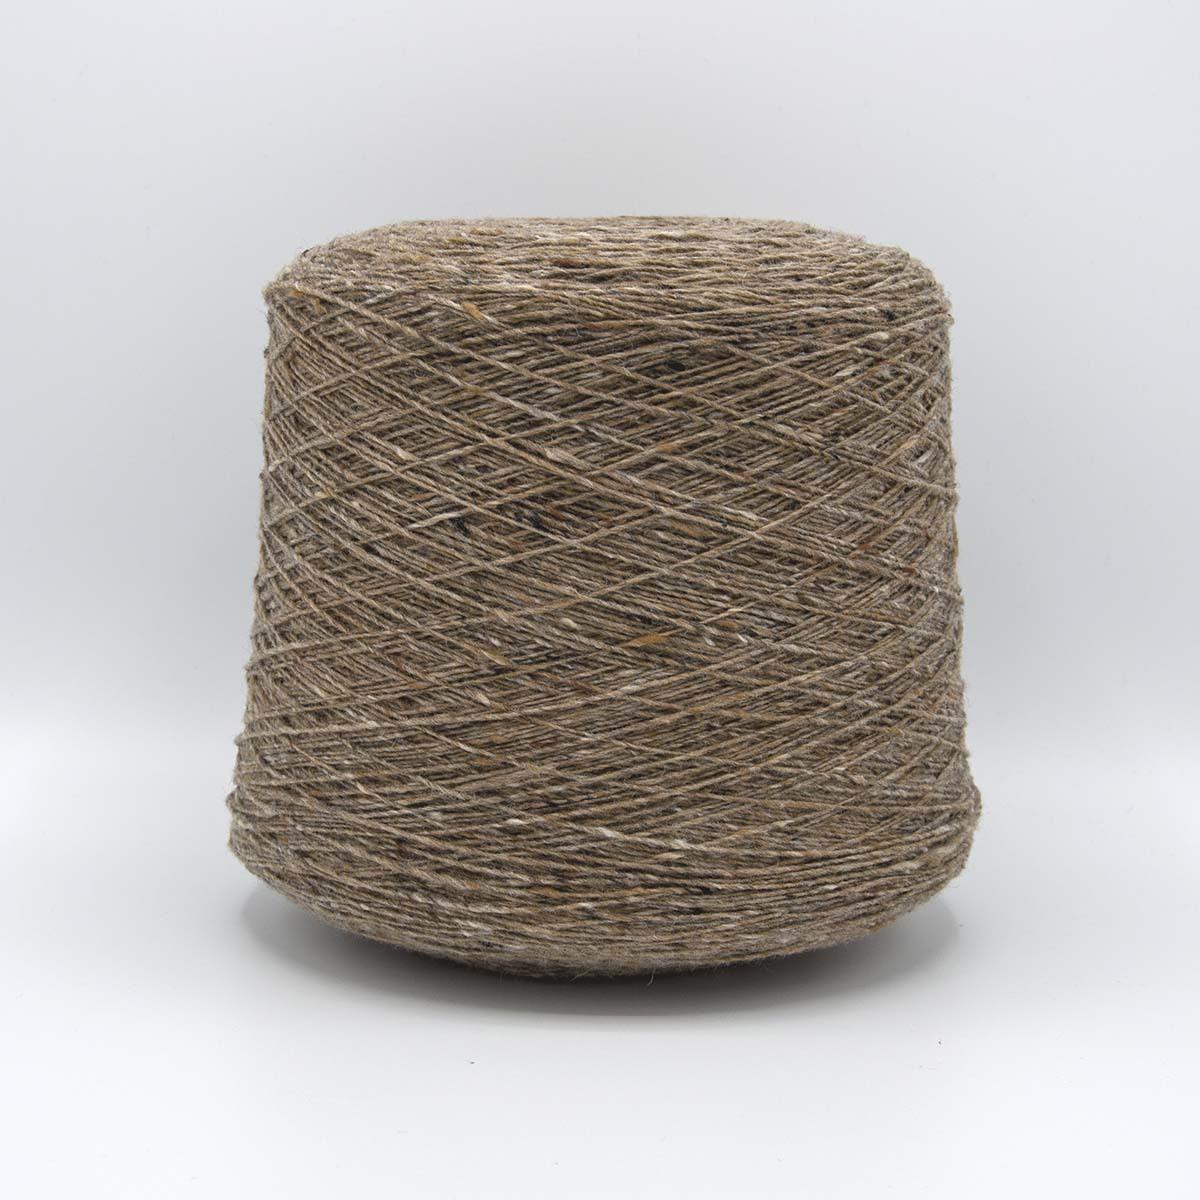 Knoll Yarns Soft Donegal (одинарный твид) - 5518